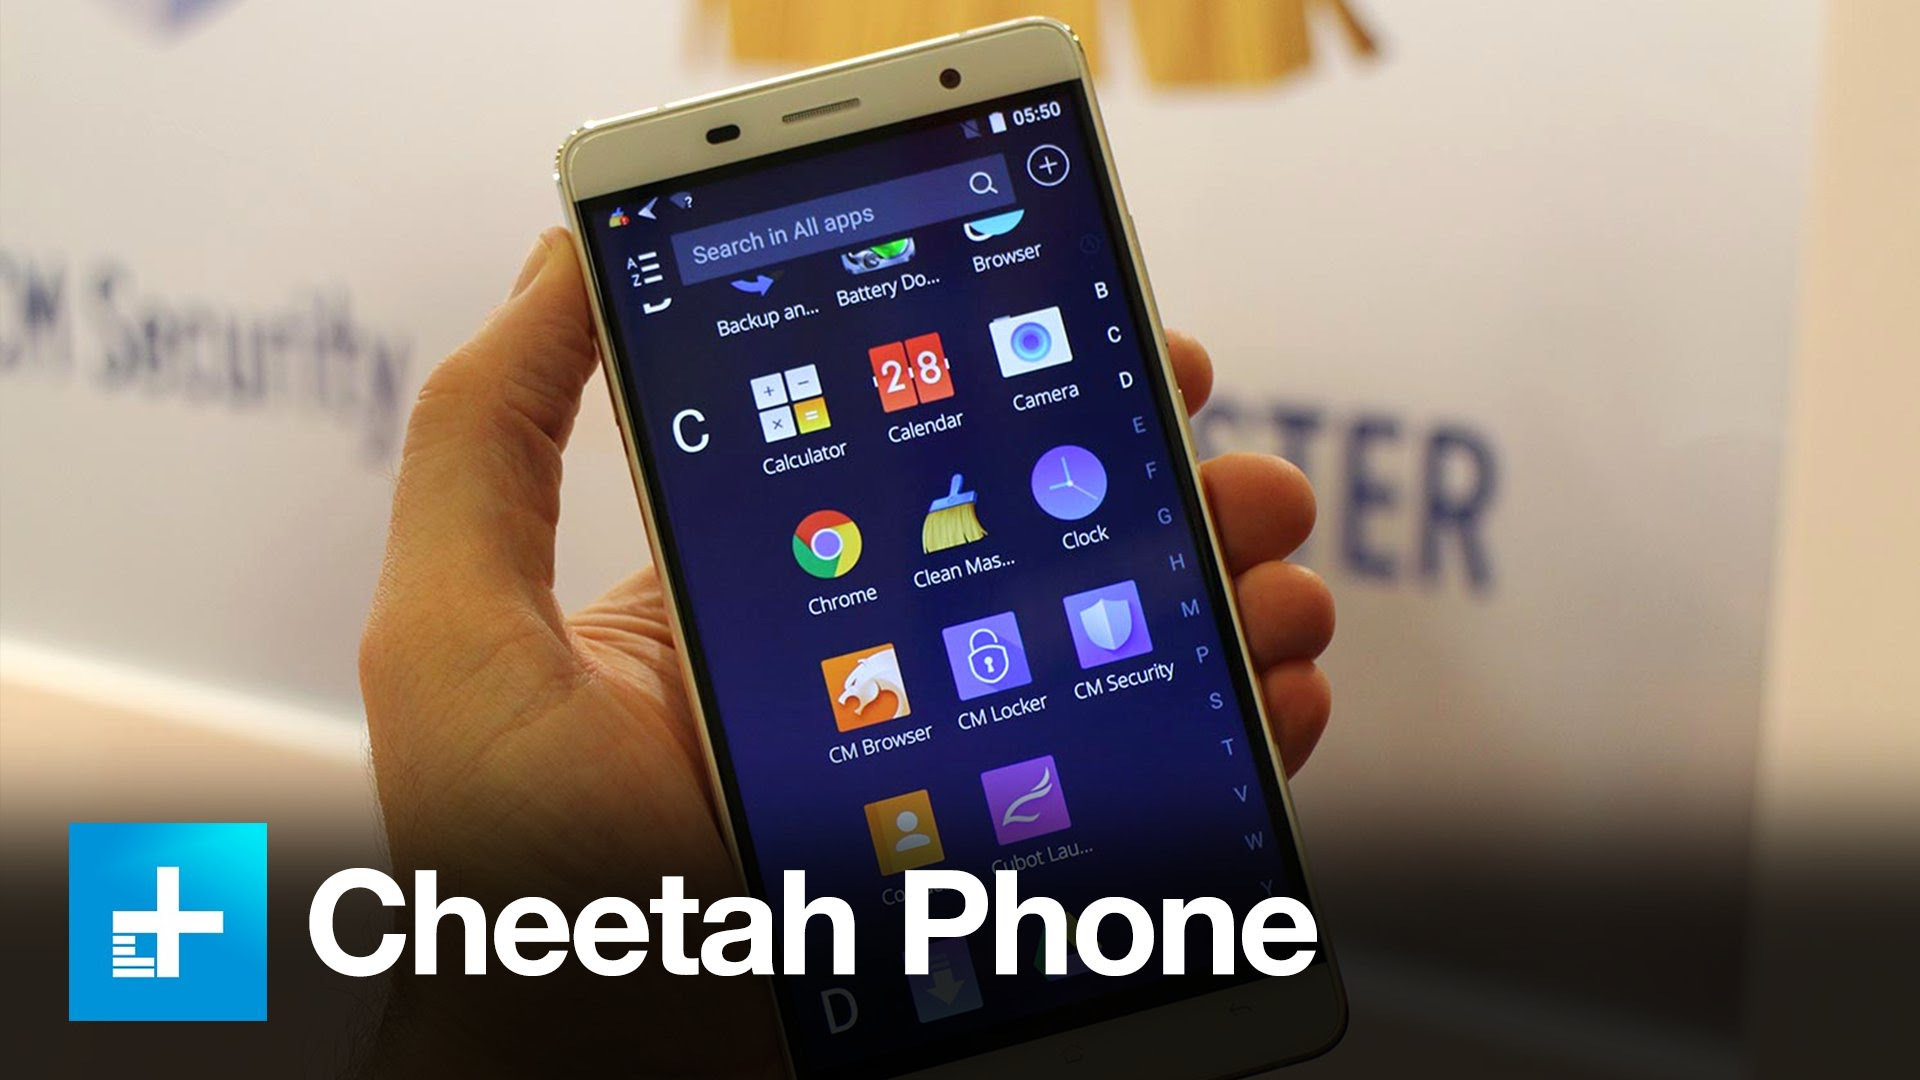 Cubot CheetahPhone